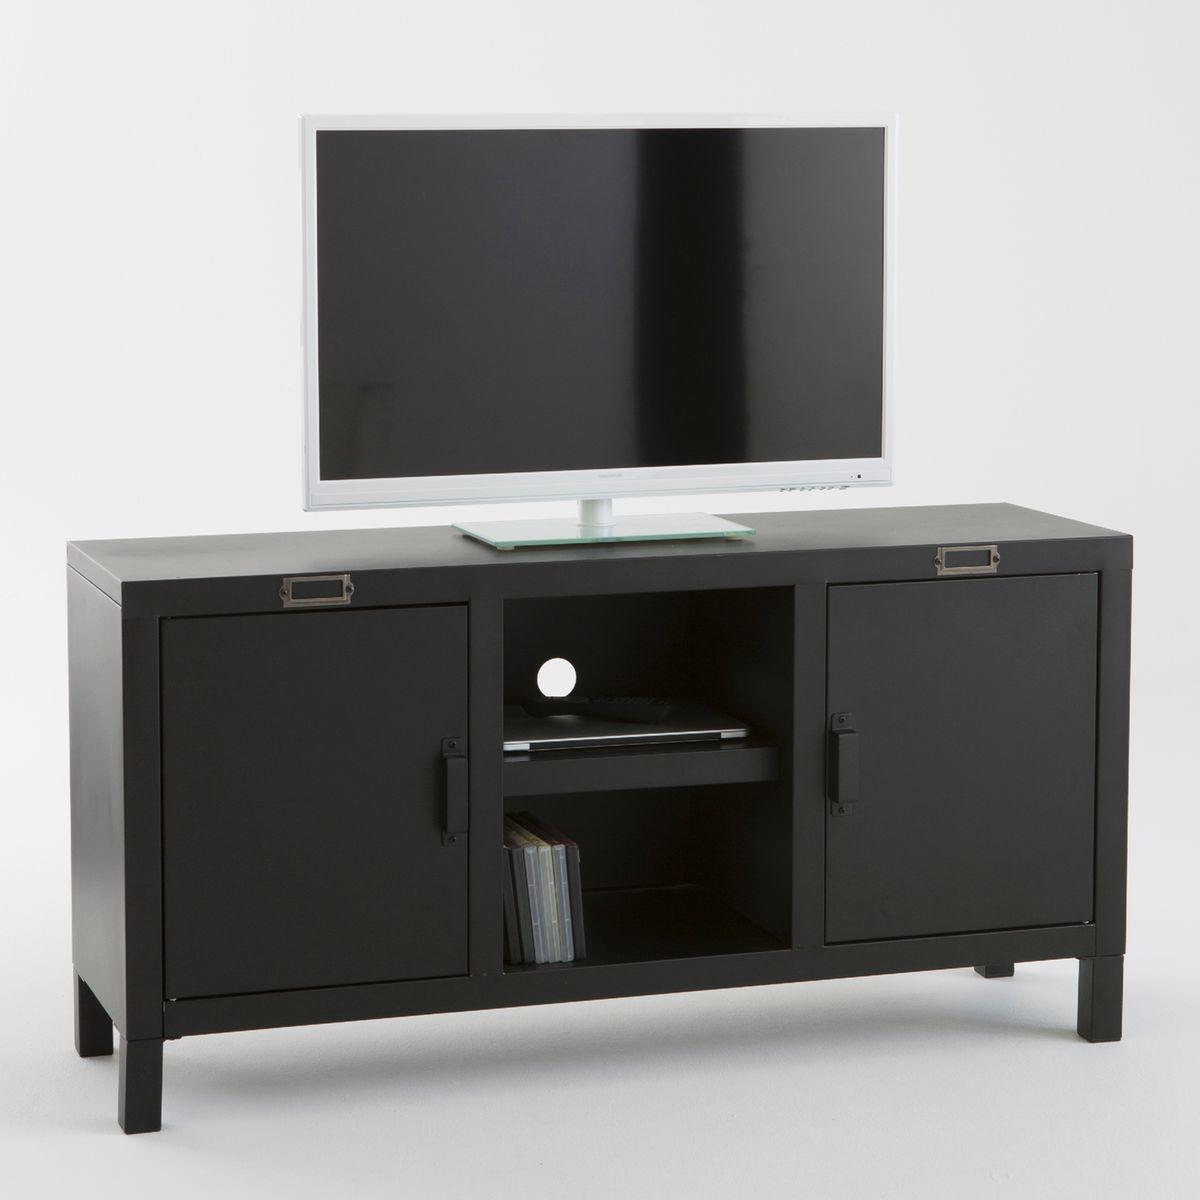 meuble tv la redoute tritoo. Black Bedroom Furniture Sets. Home Design Ideas